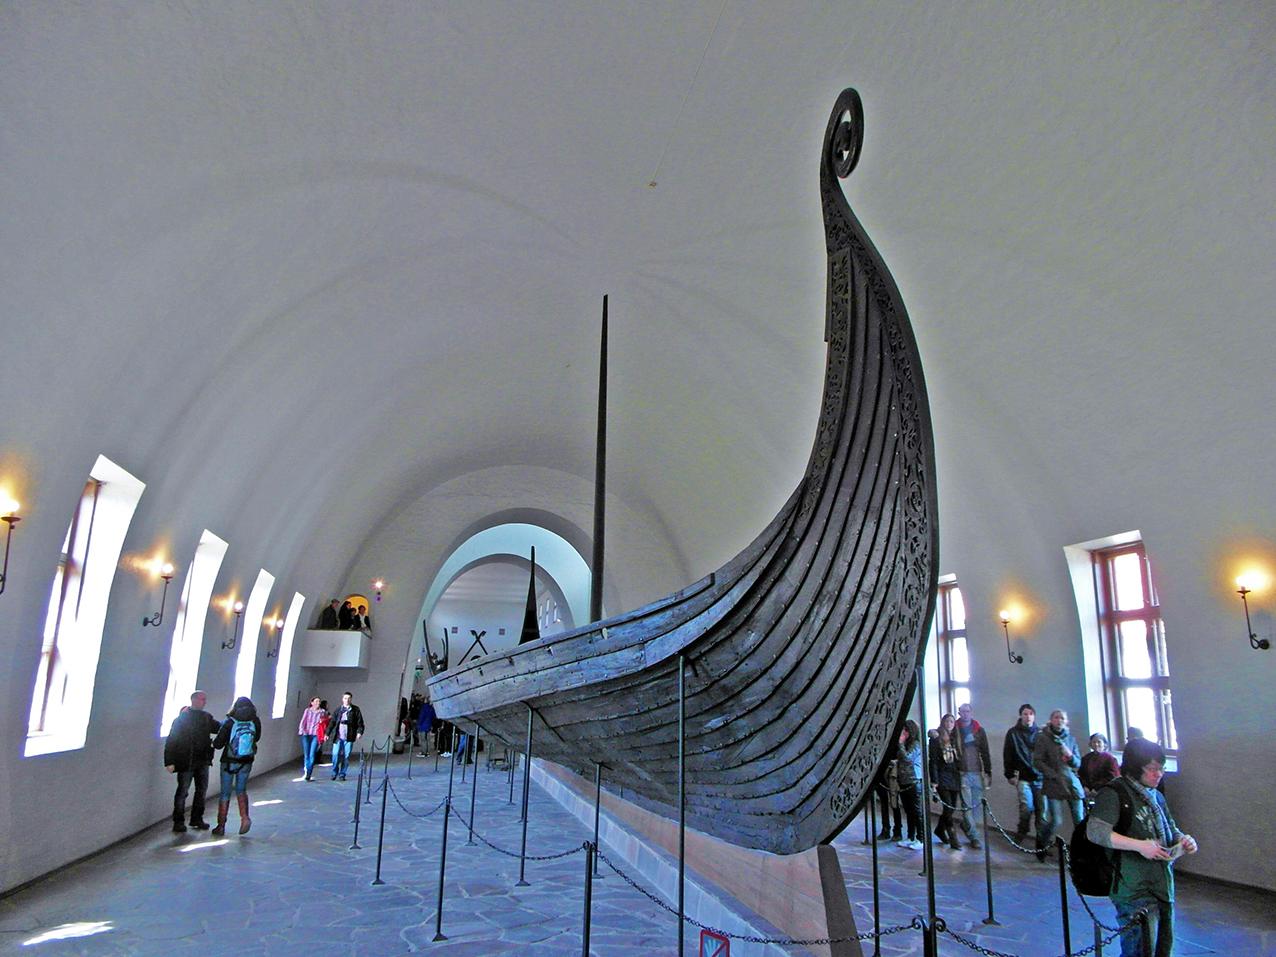 Viking Ship Museum – Foto: VISITOSLO/Tord Baklund